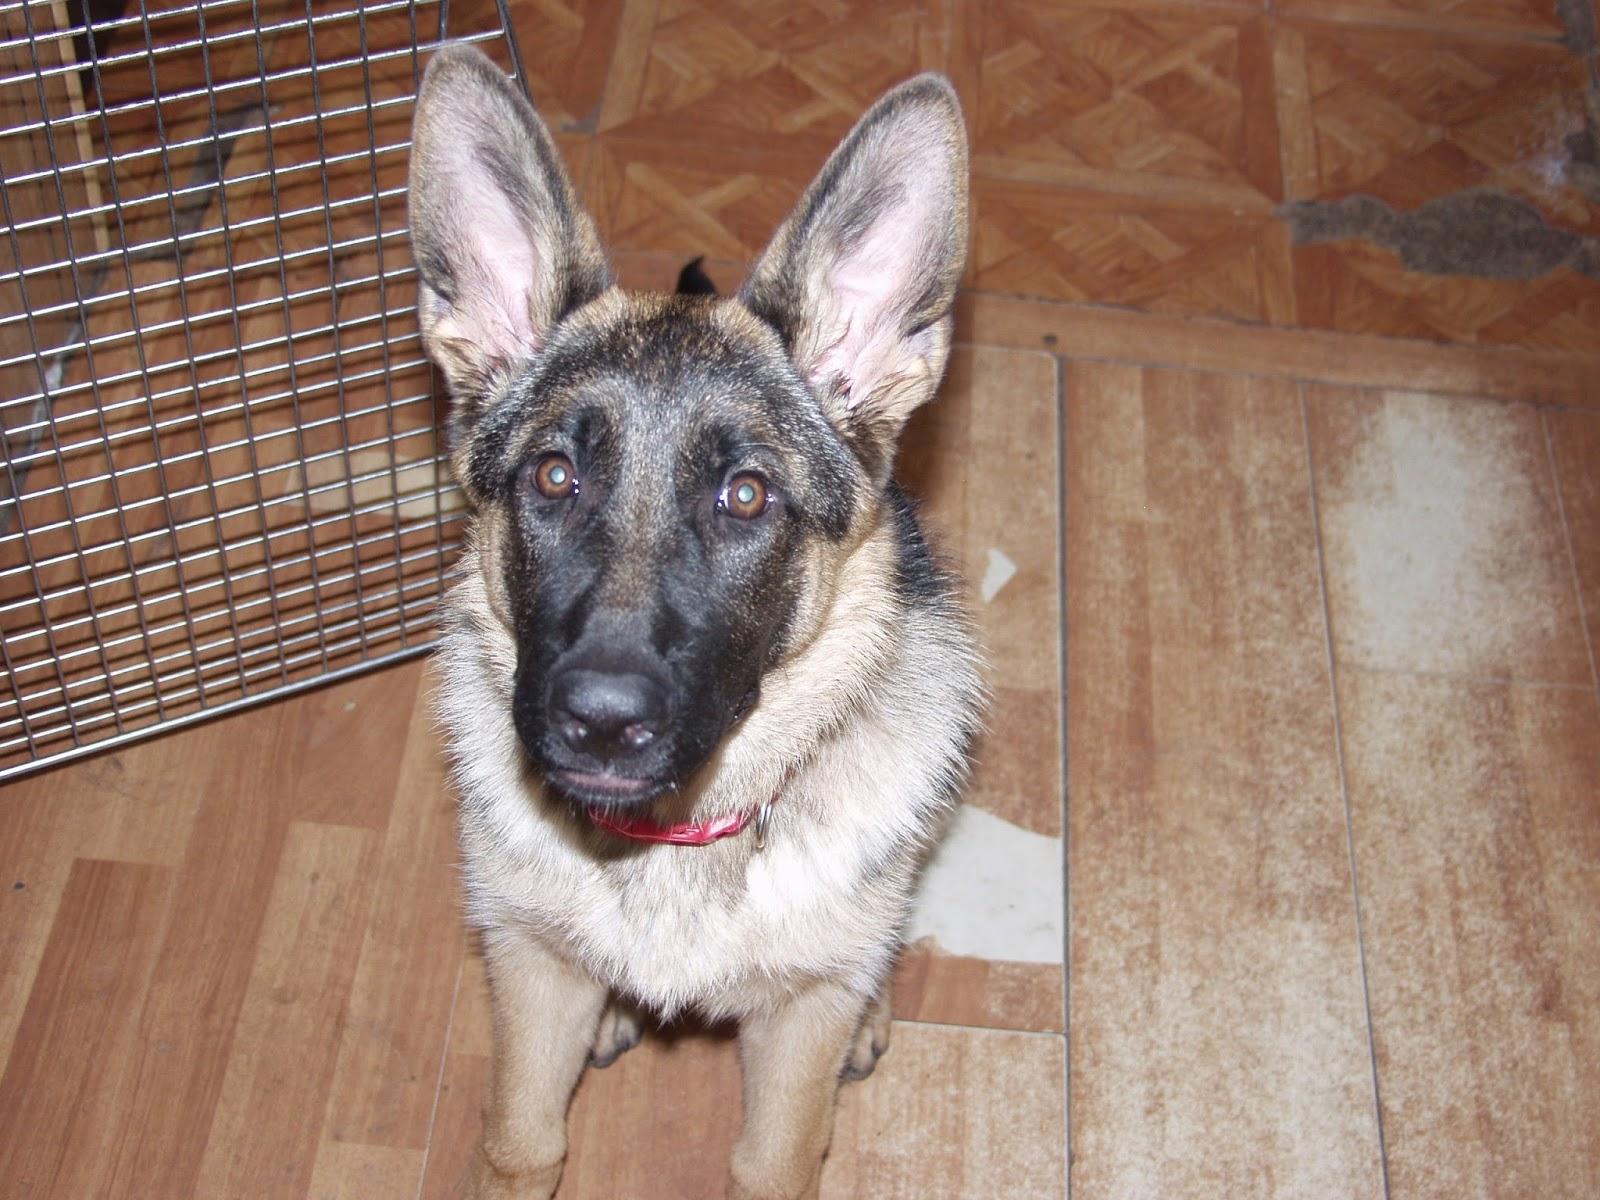 Dakota - service dog in training